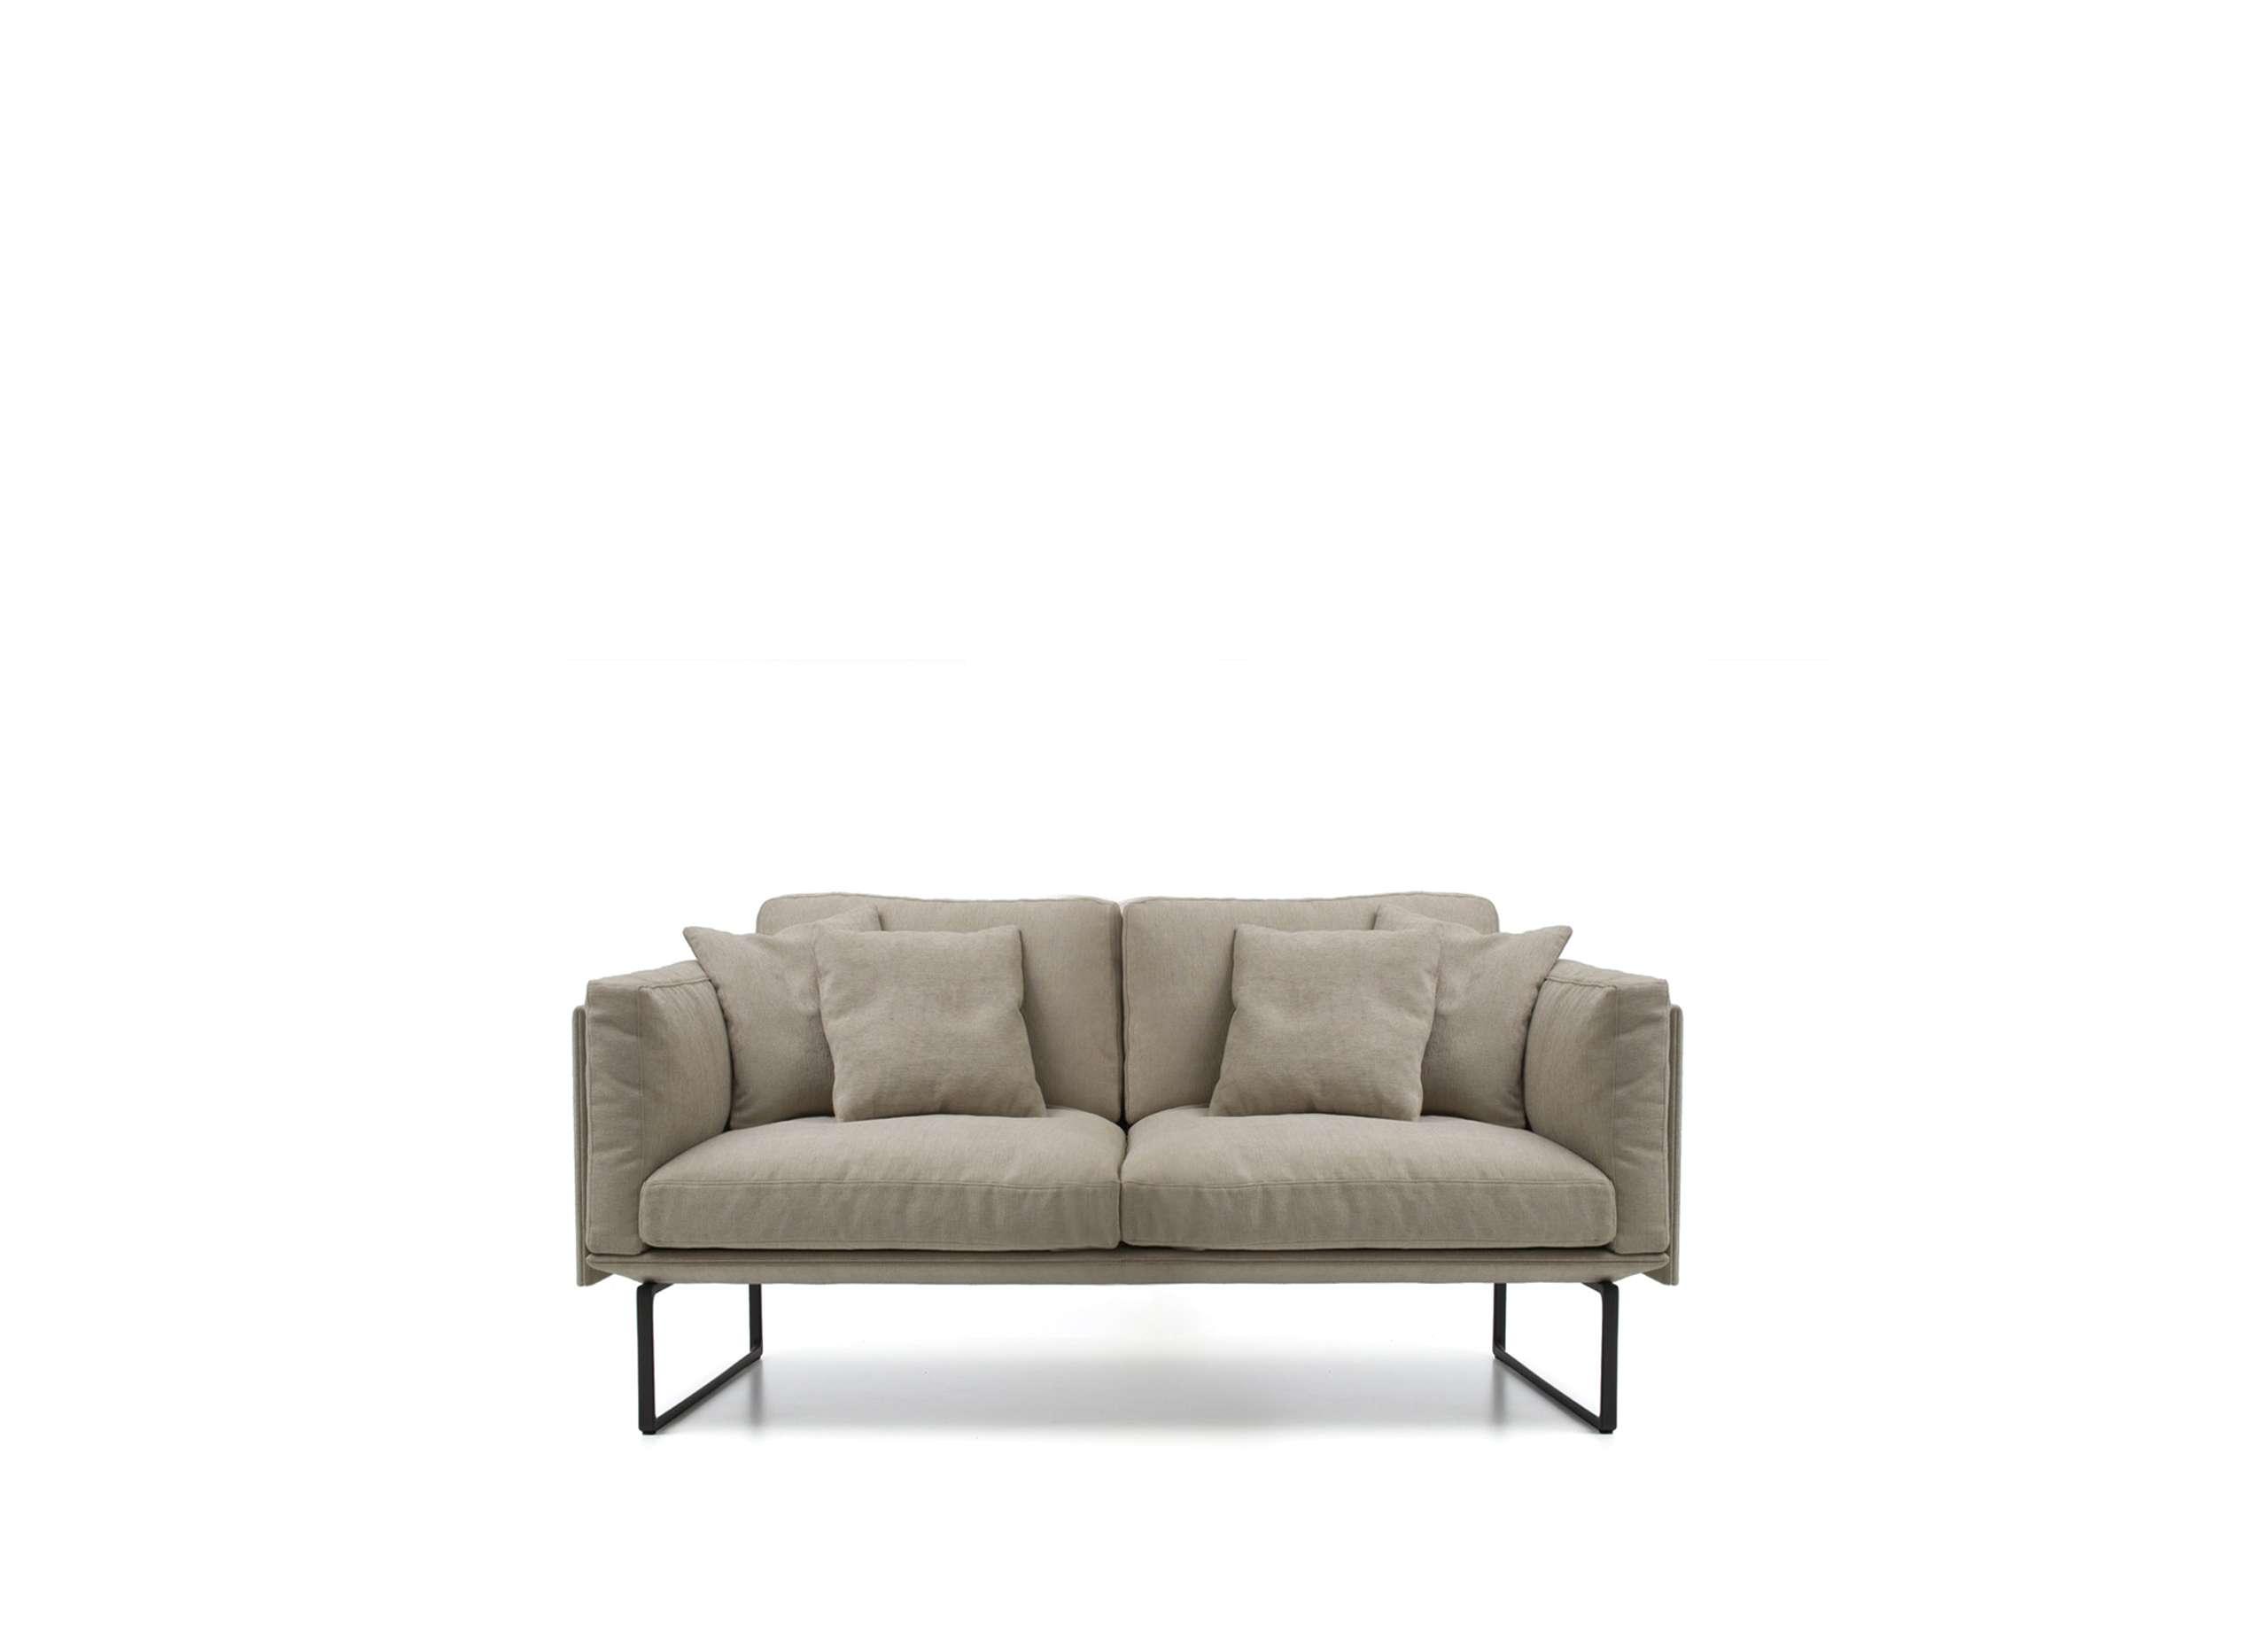 Cassina 202 8 otto sofa the qvest shop parisarafo Image collections